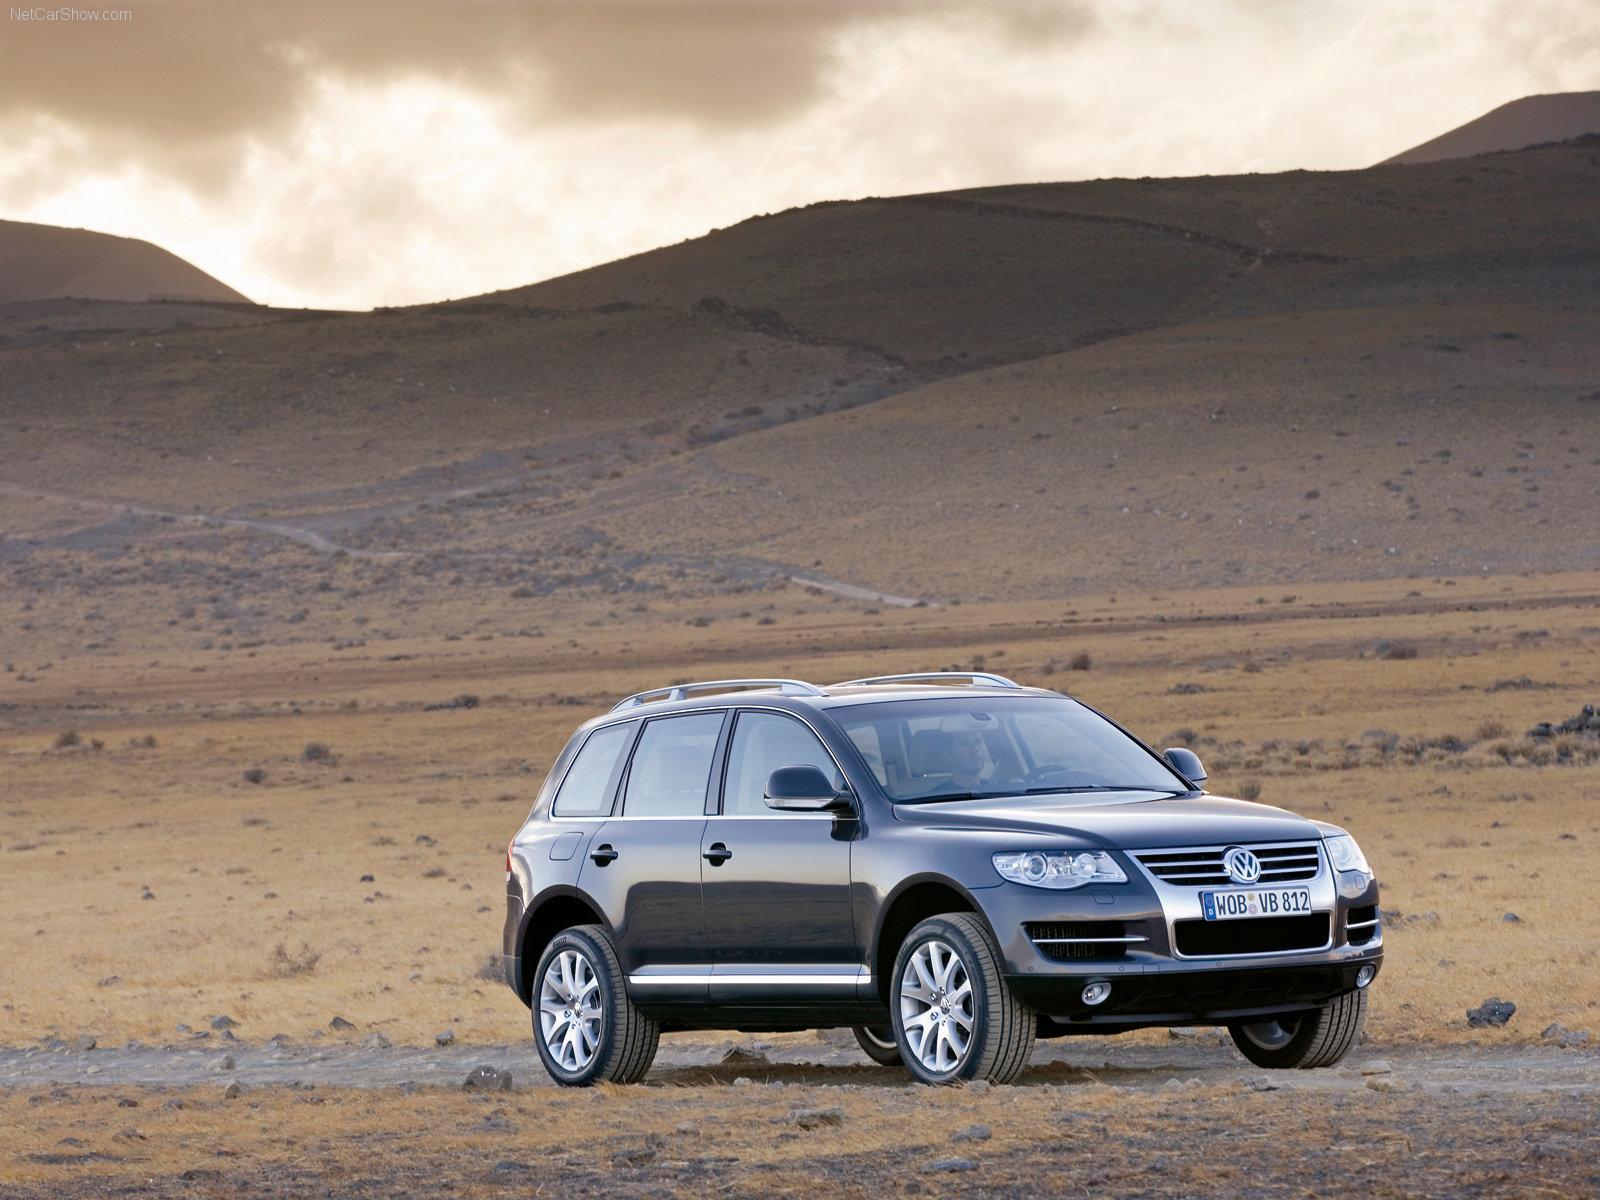 https://w04.ru/foto/Volkswagen-Touareg_2007_1600x1200_wallpaper_08.jpg